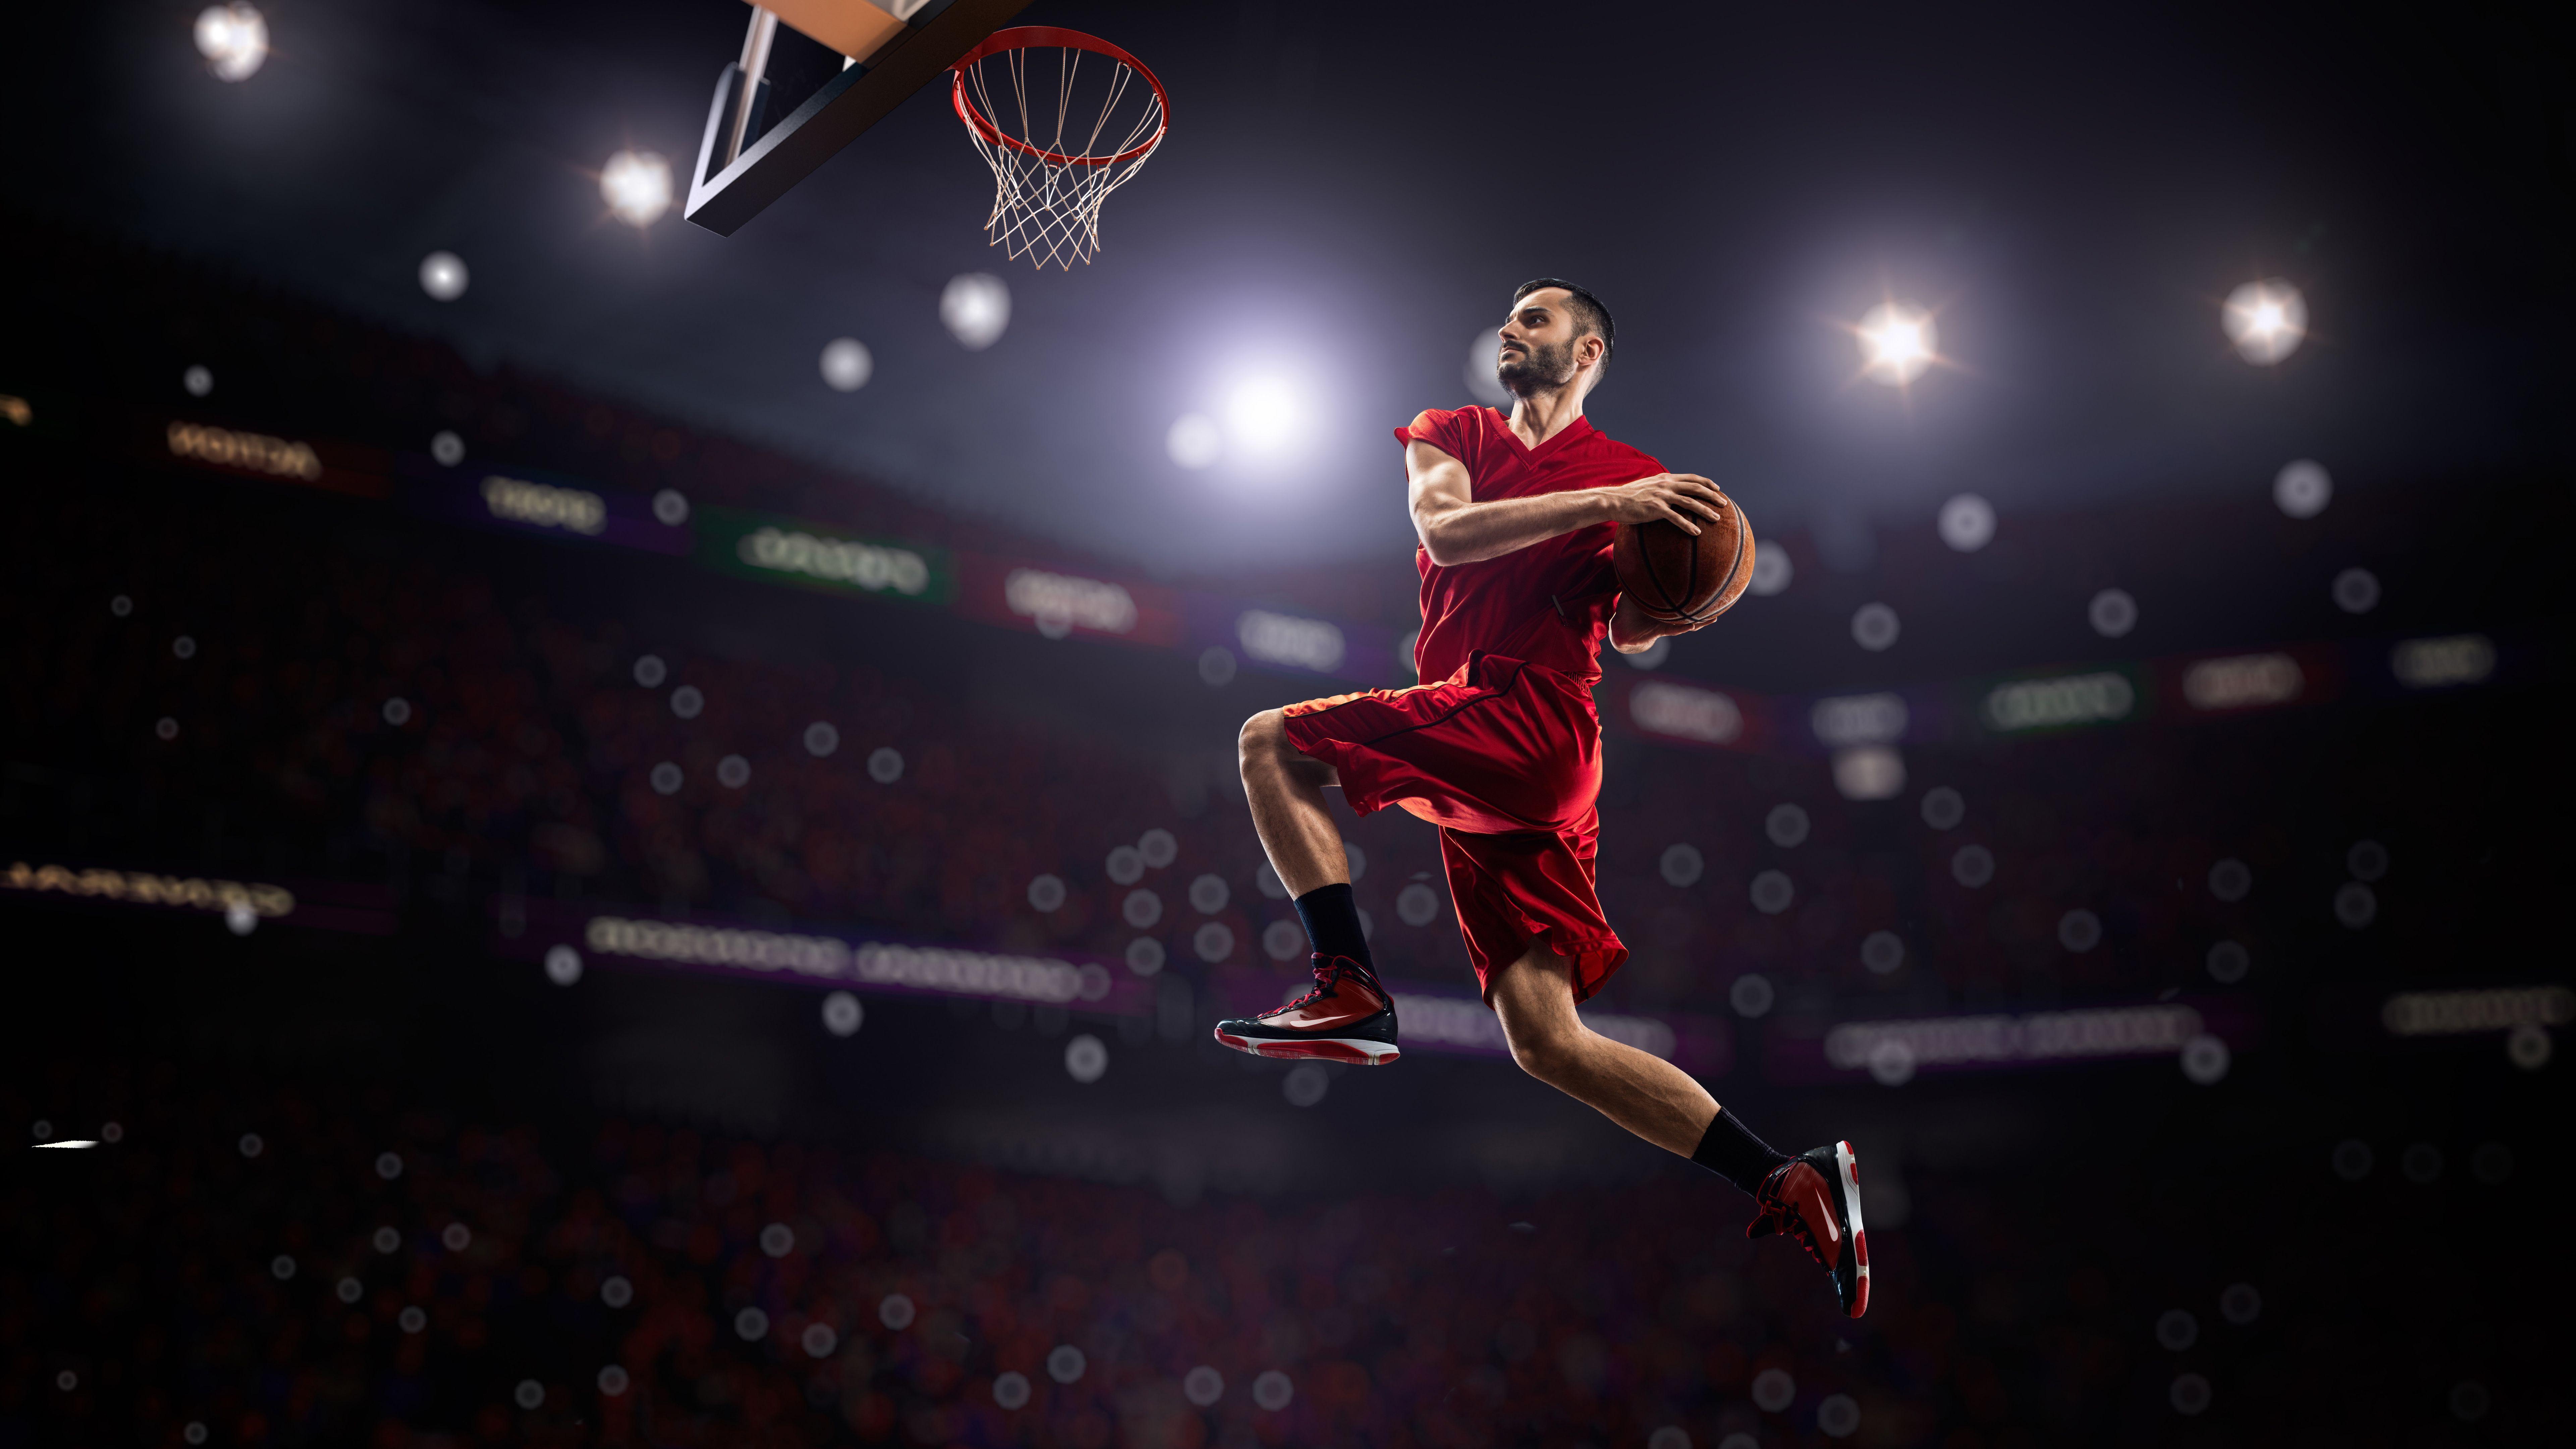 4k Basketball Wallpapers Top Free 4k Basketball Backgrounds Wallpaperaccess